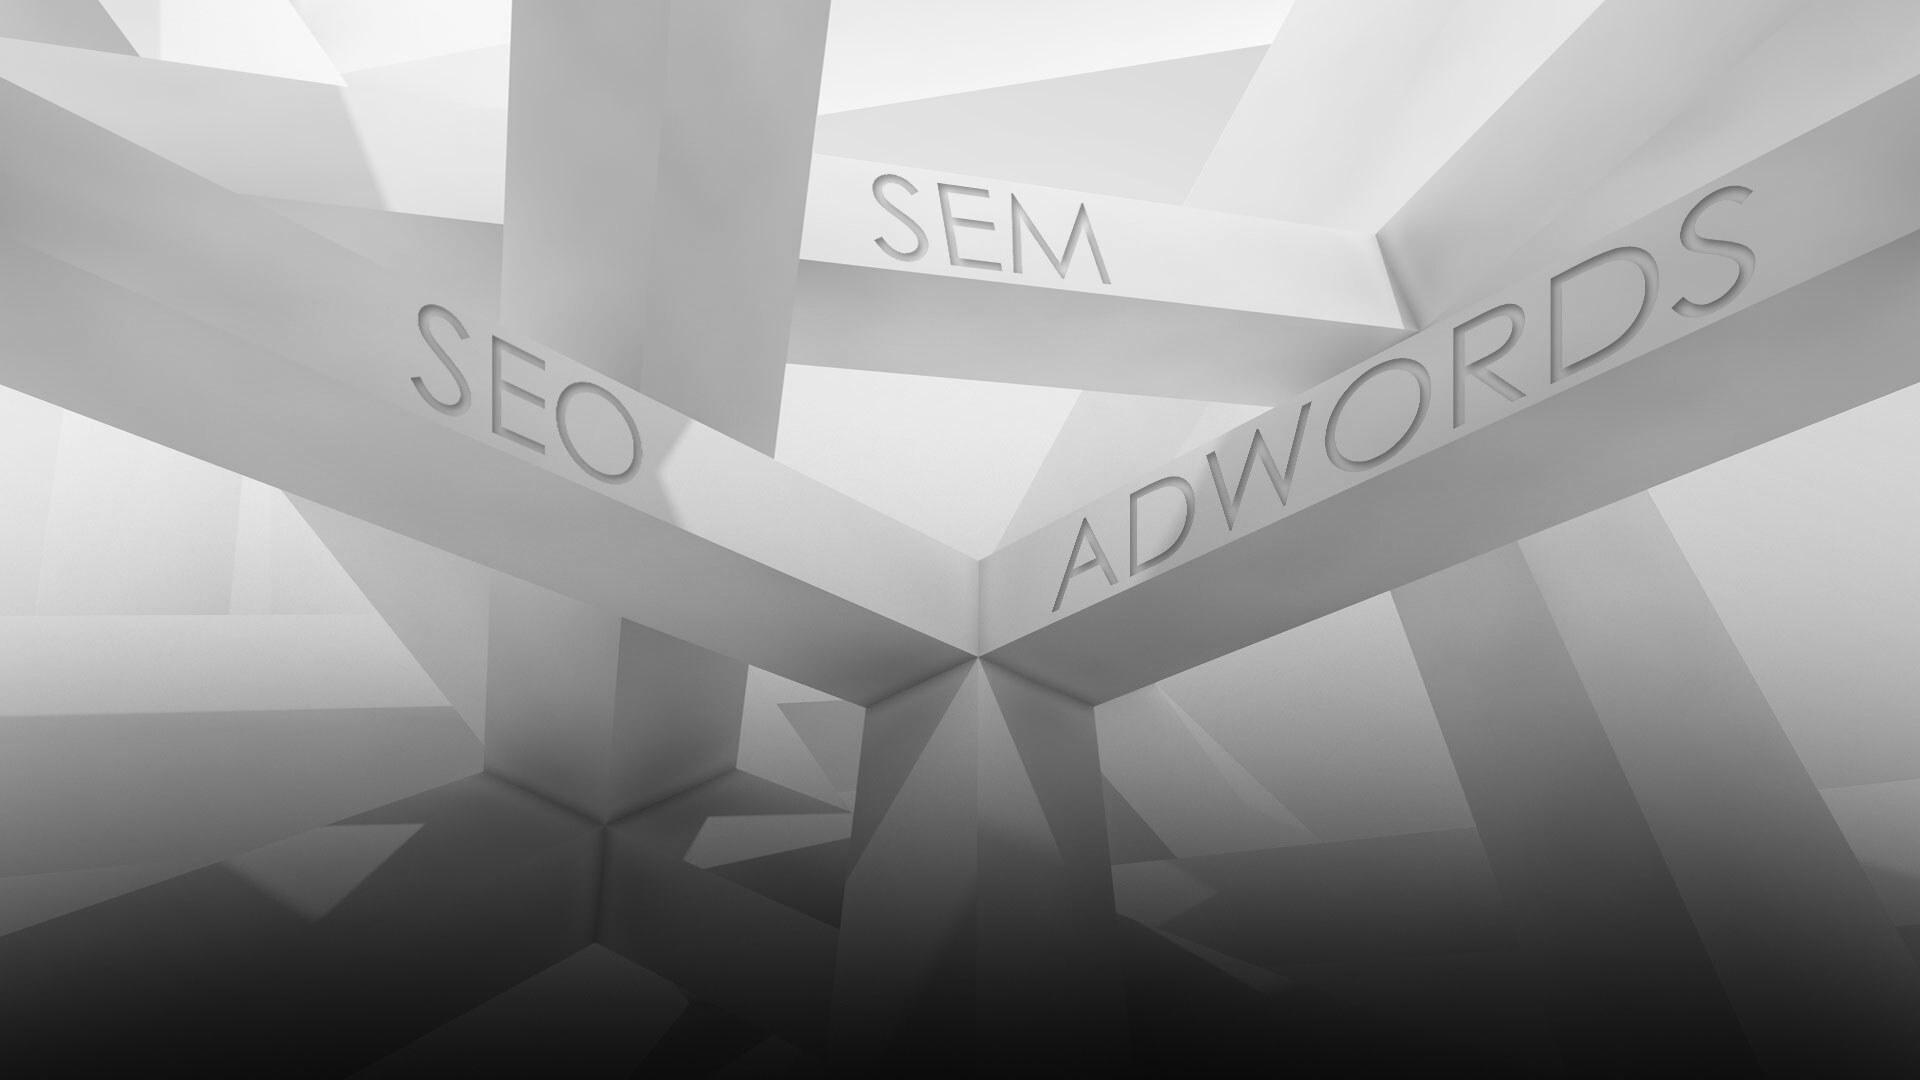 Seo Sem Adwords